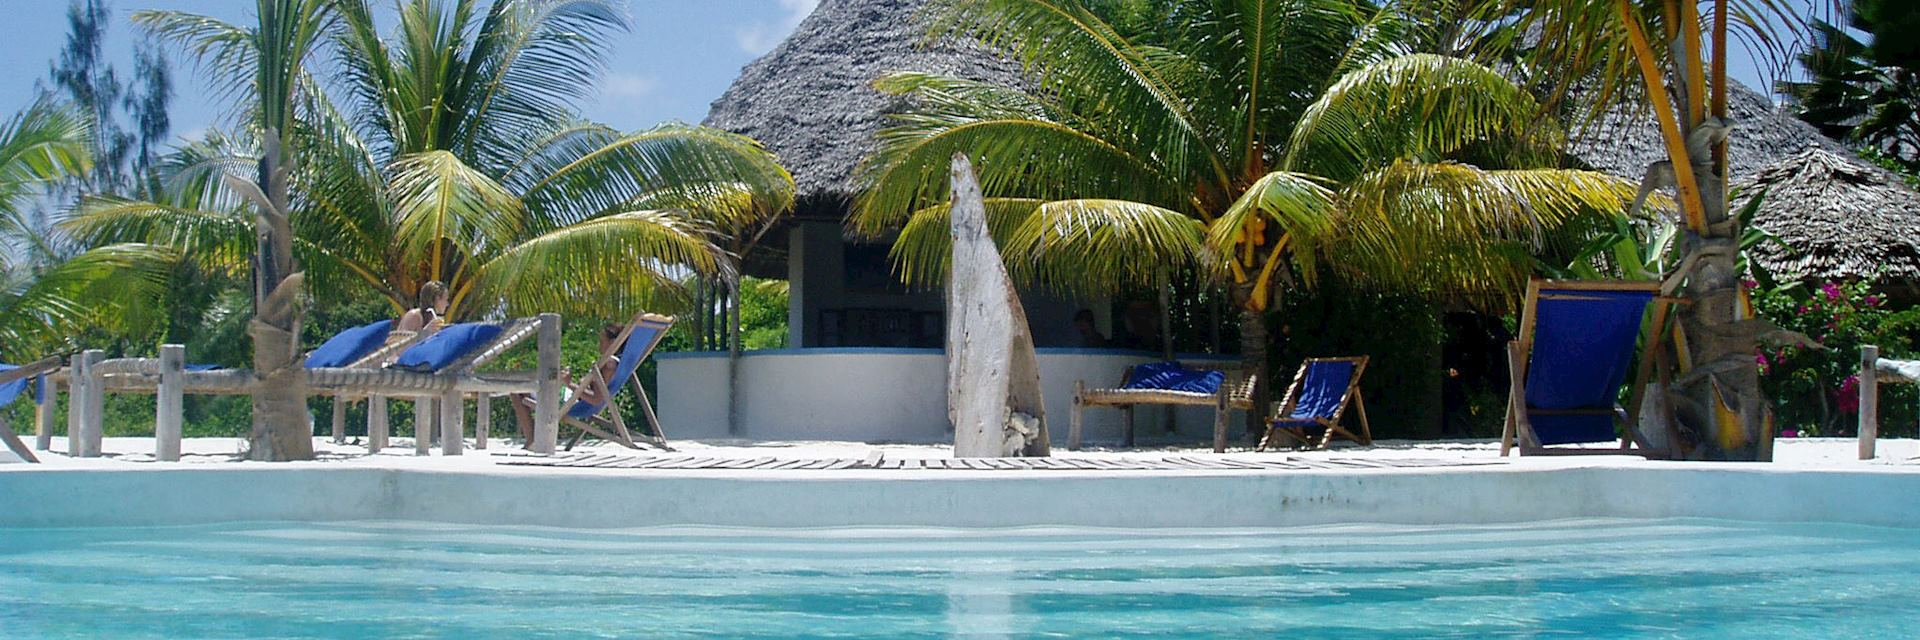 Shooting Star Lodge, Zanzibar Island